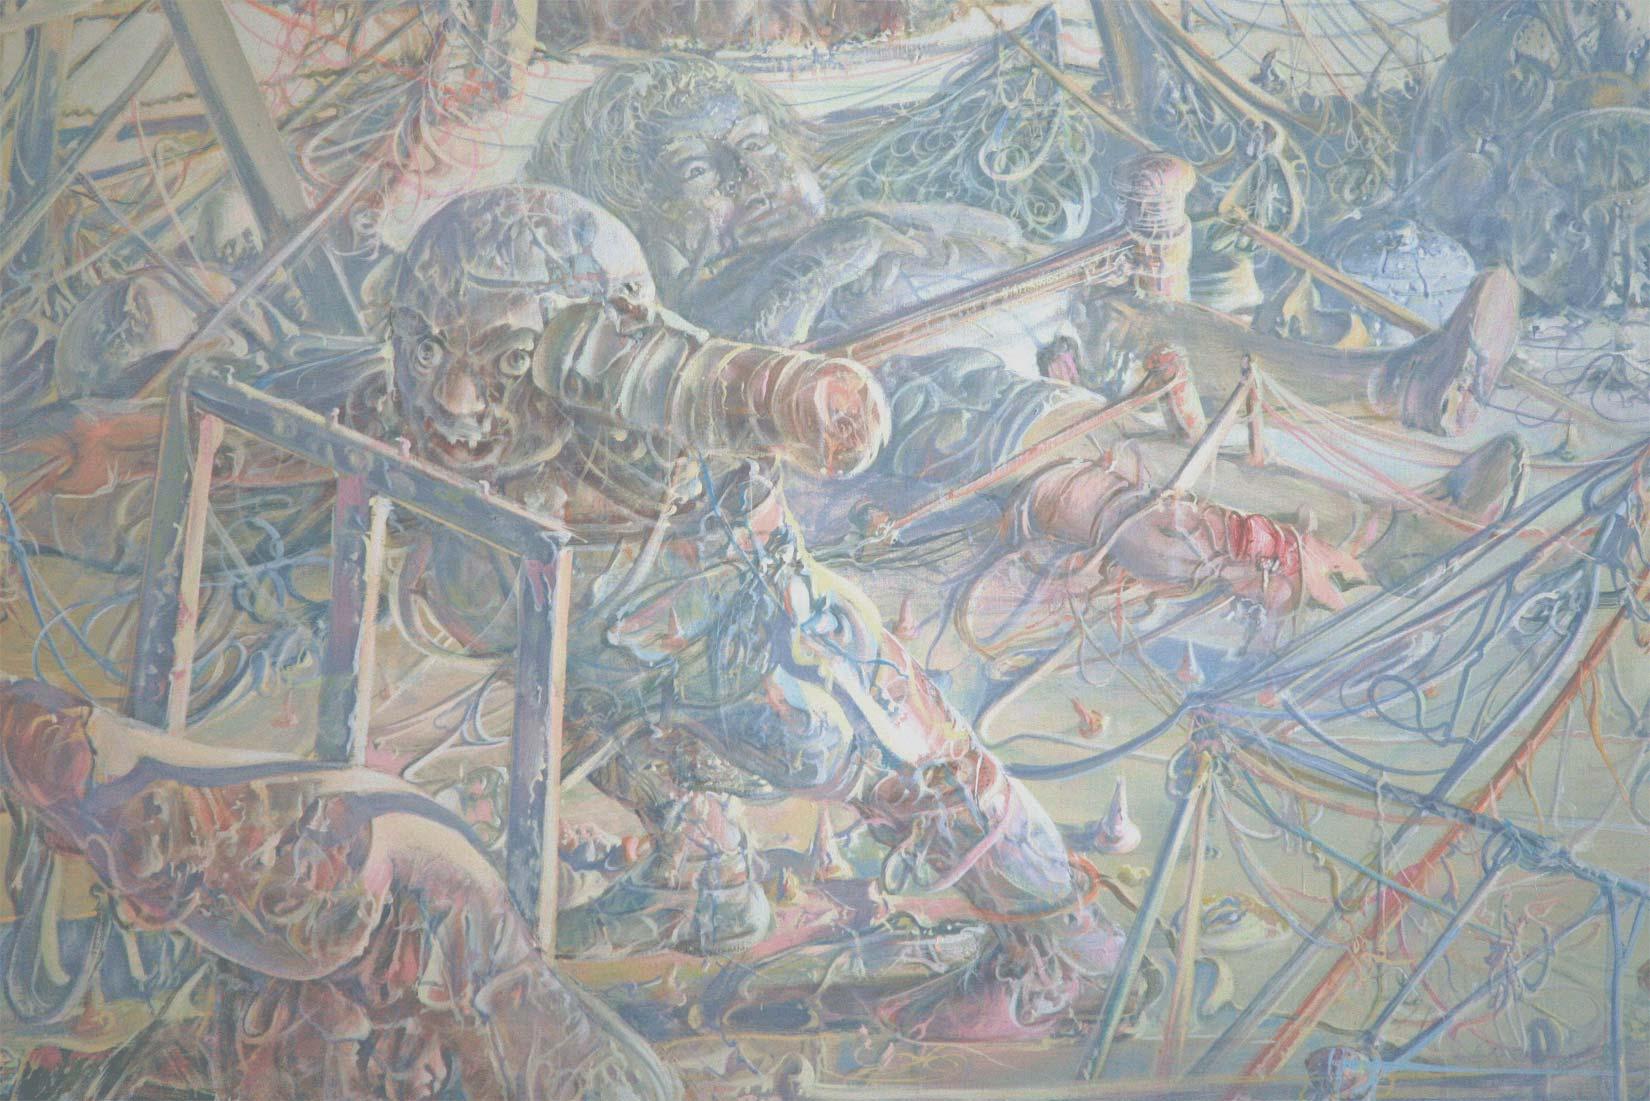 Dadova slikaAtelje, 1972 (detalj)